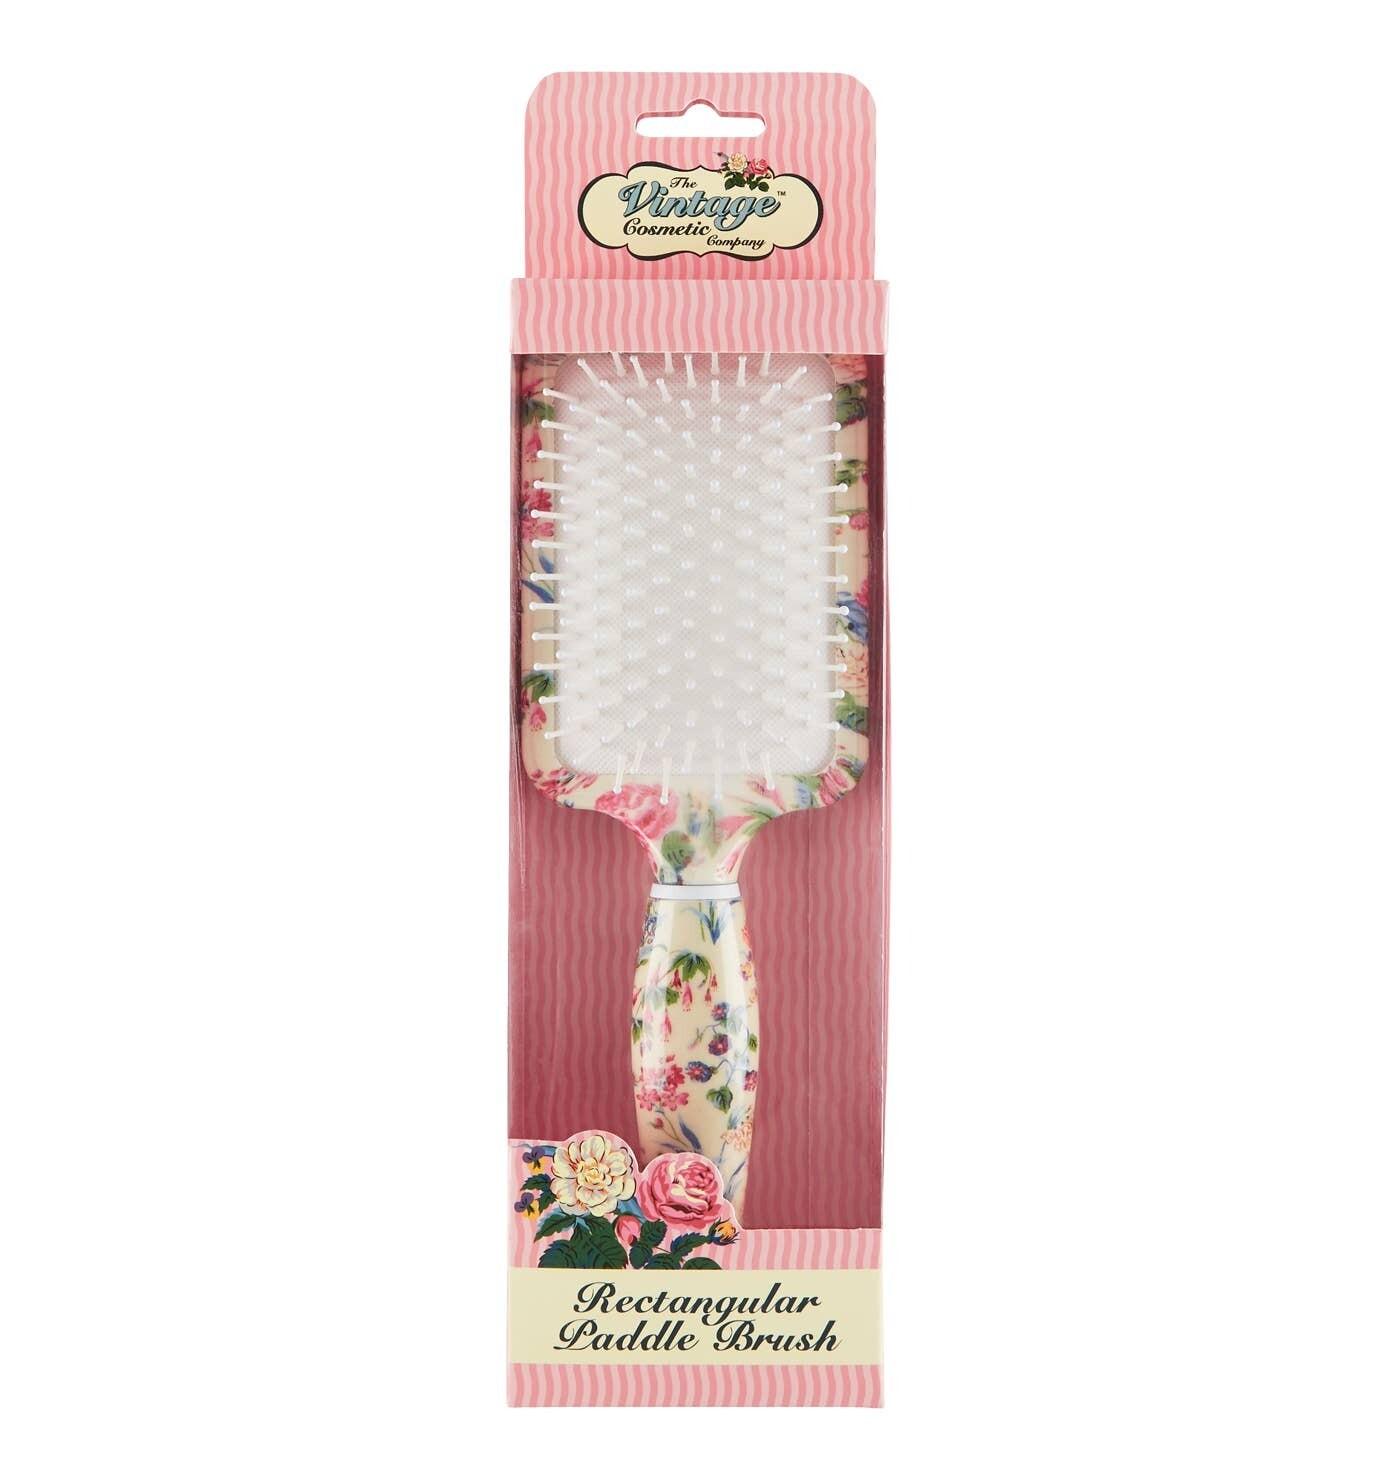 VC Floral Paddle Brush